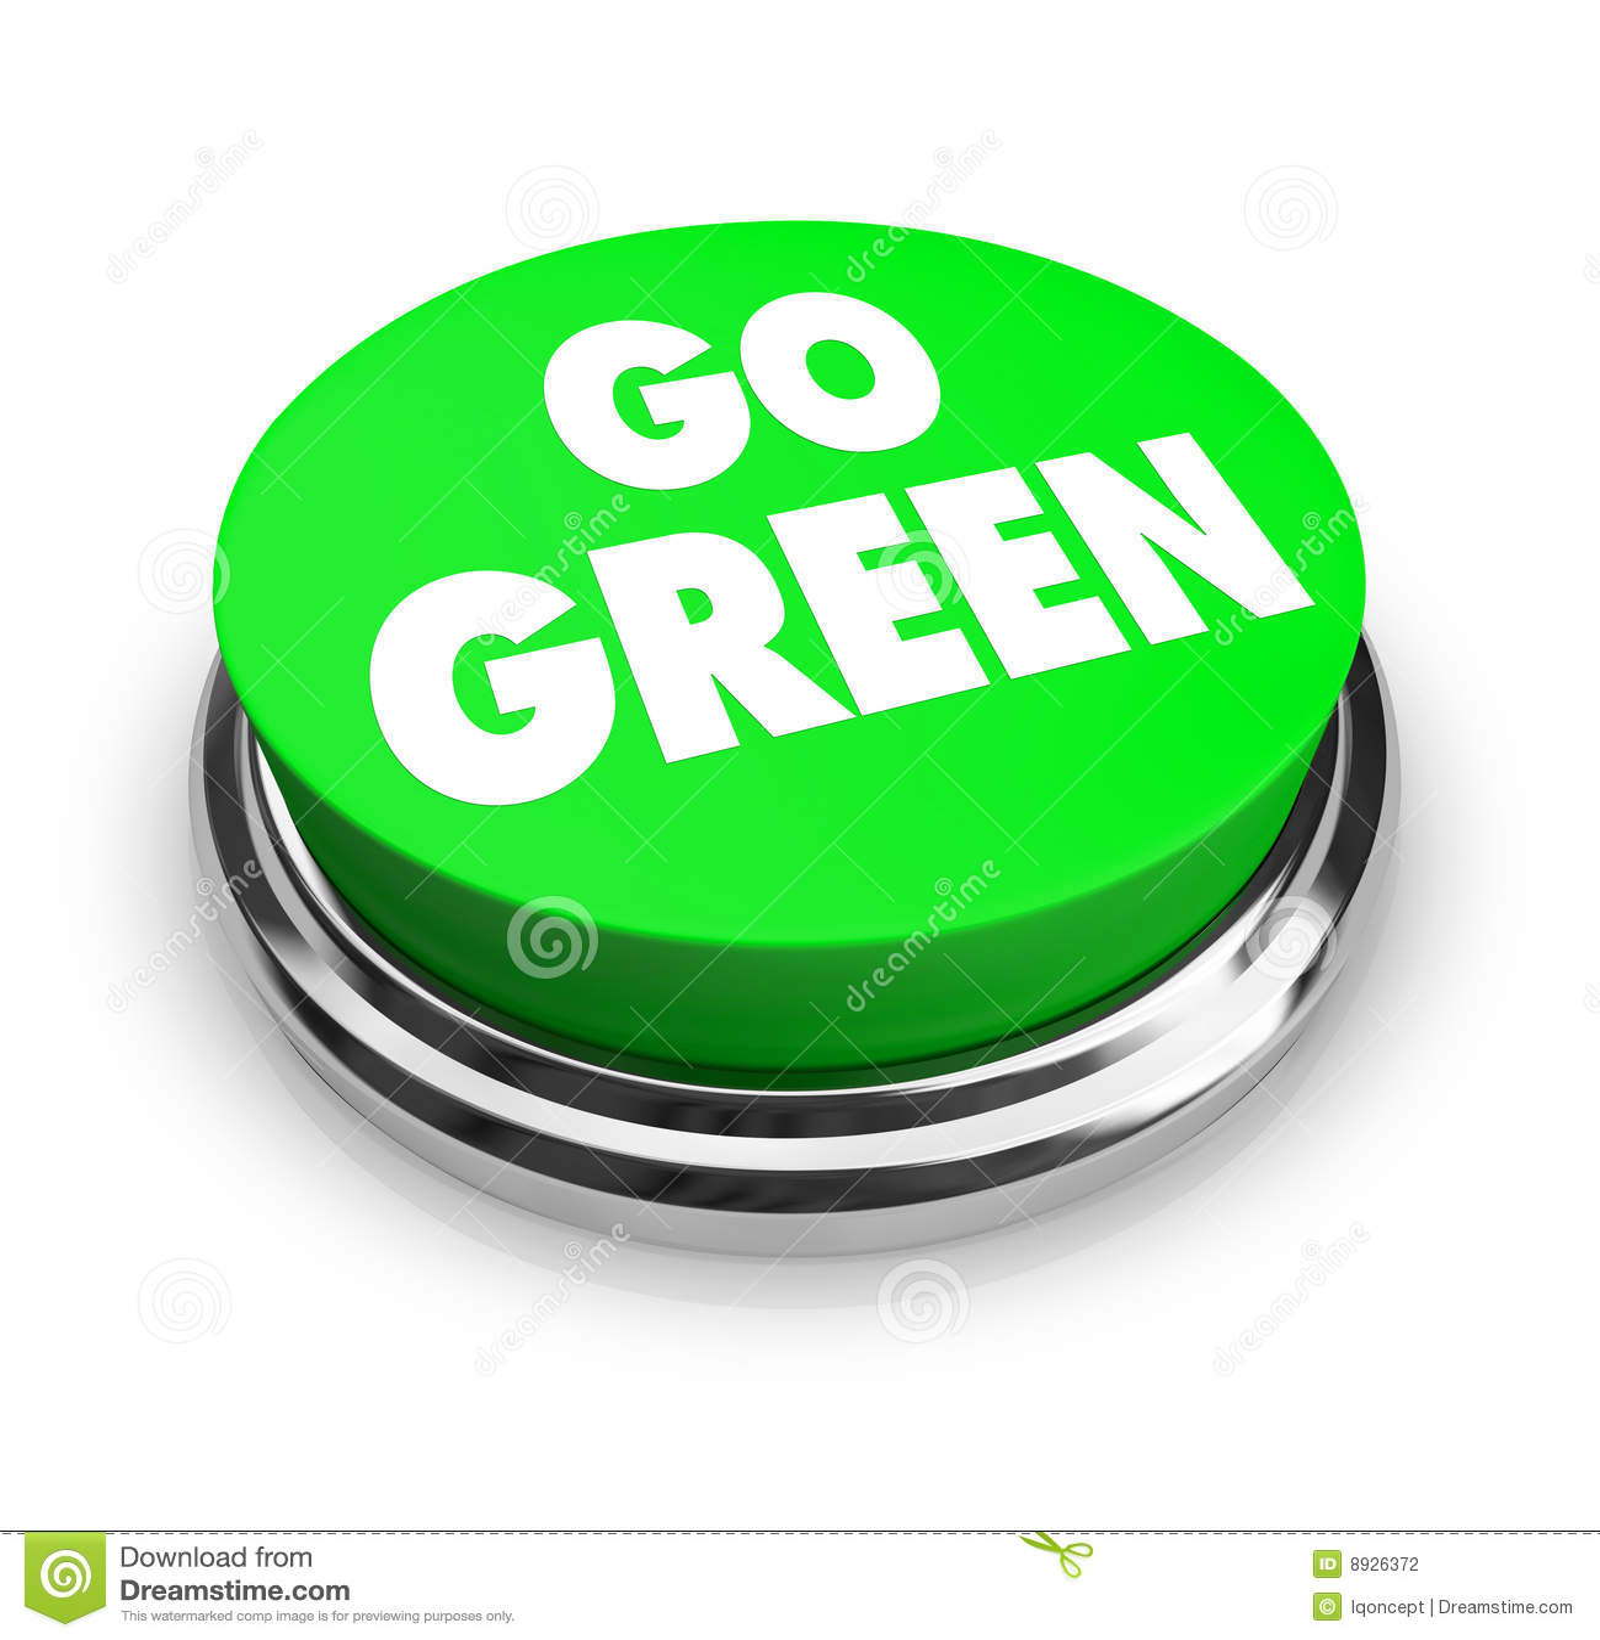 Go green button stock illustration. Illustration of round